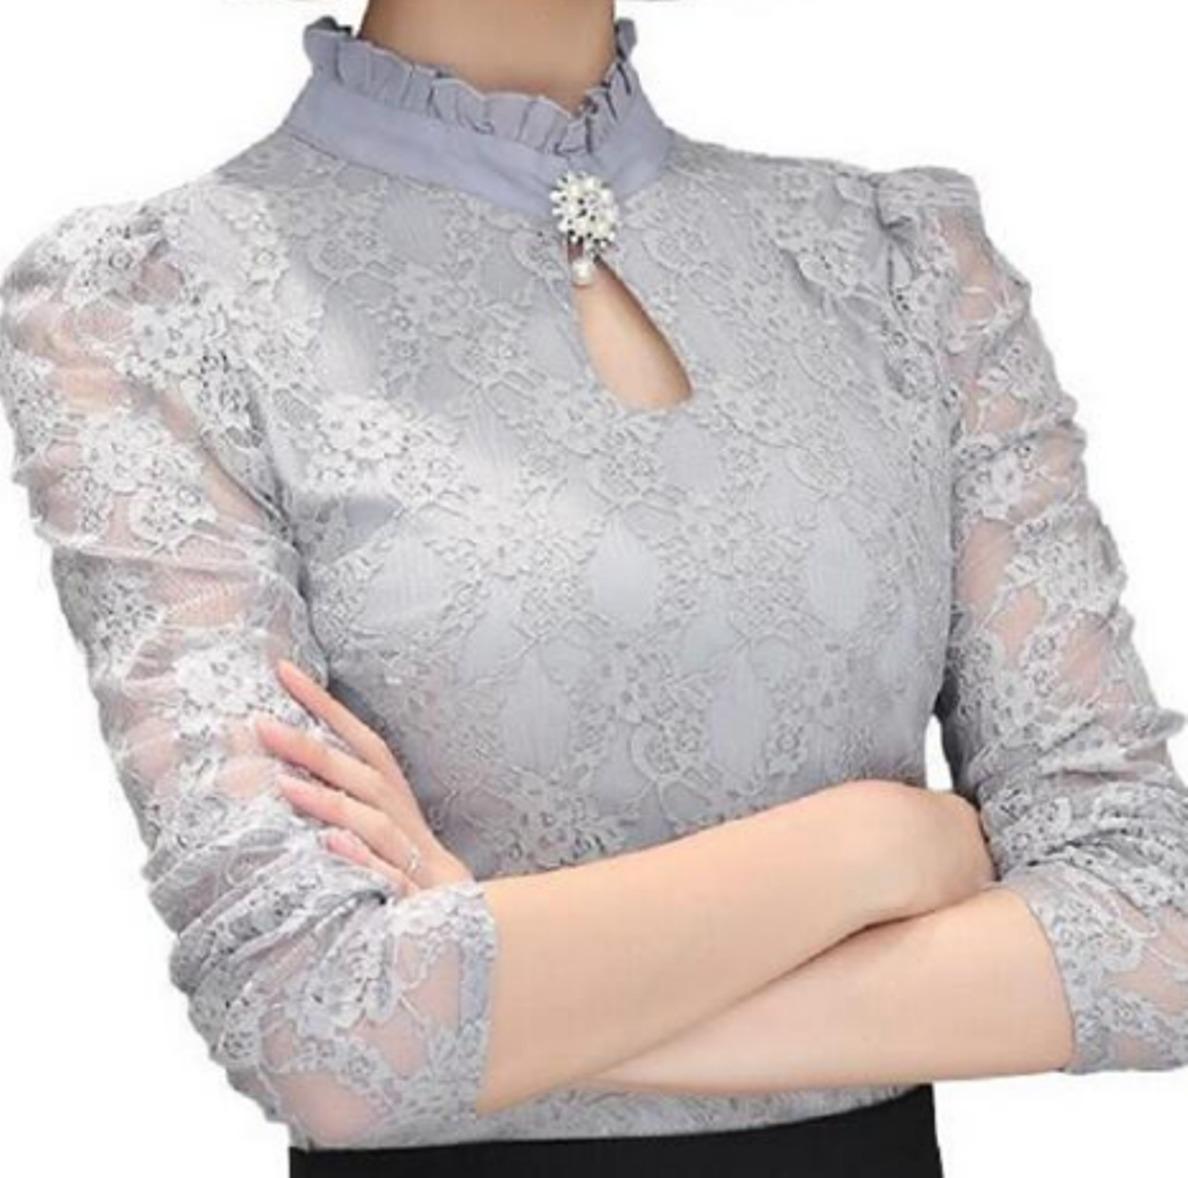 3d6c50e6b6 camisa feminino blusa social manga longa rendaluxo foto real. Carregando  zoom.